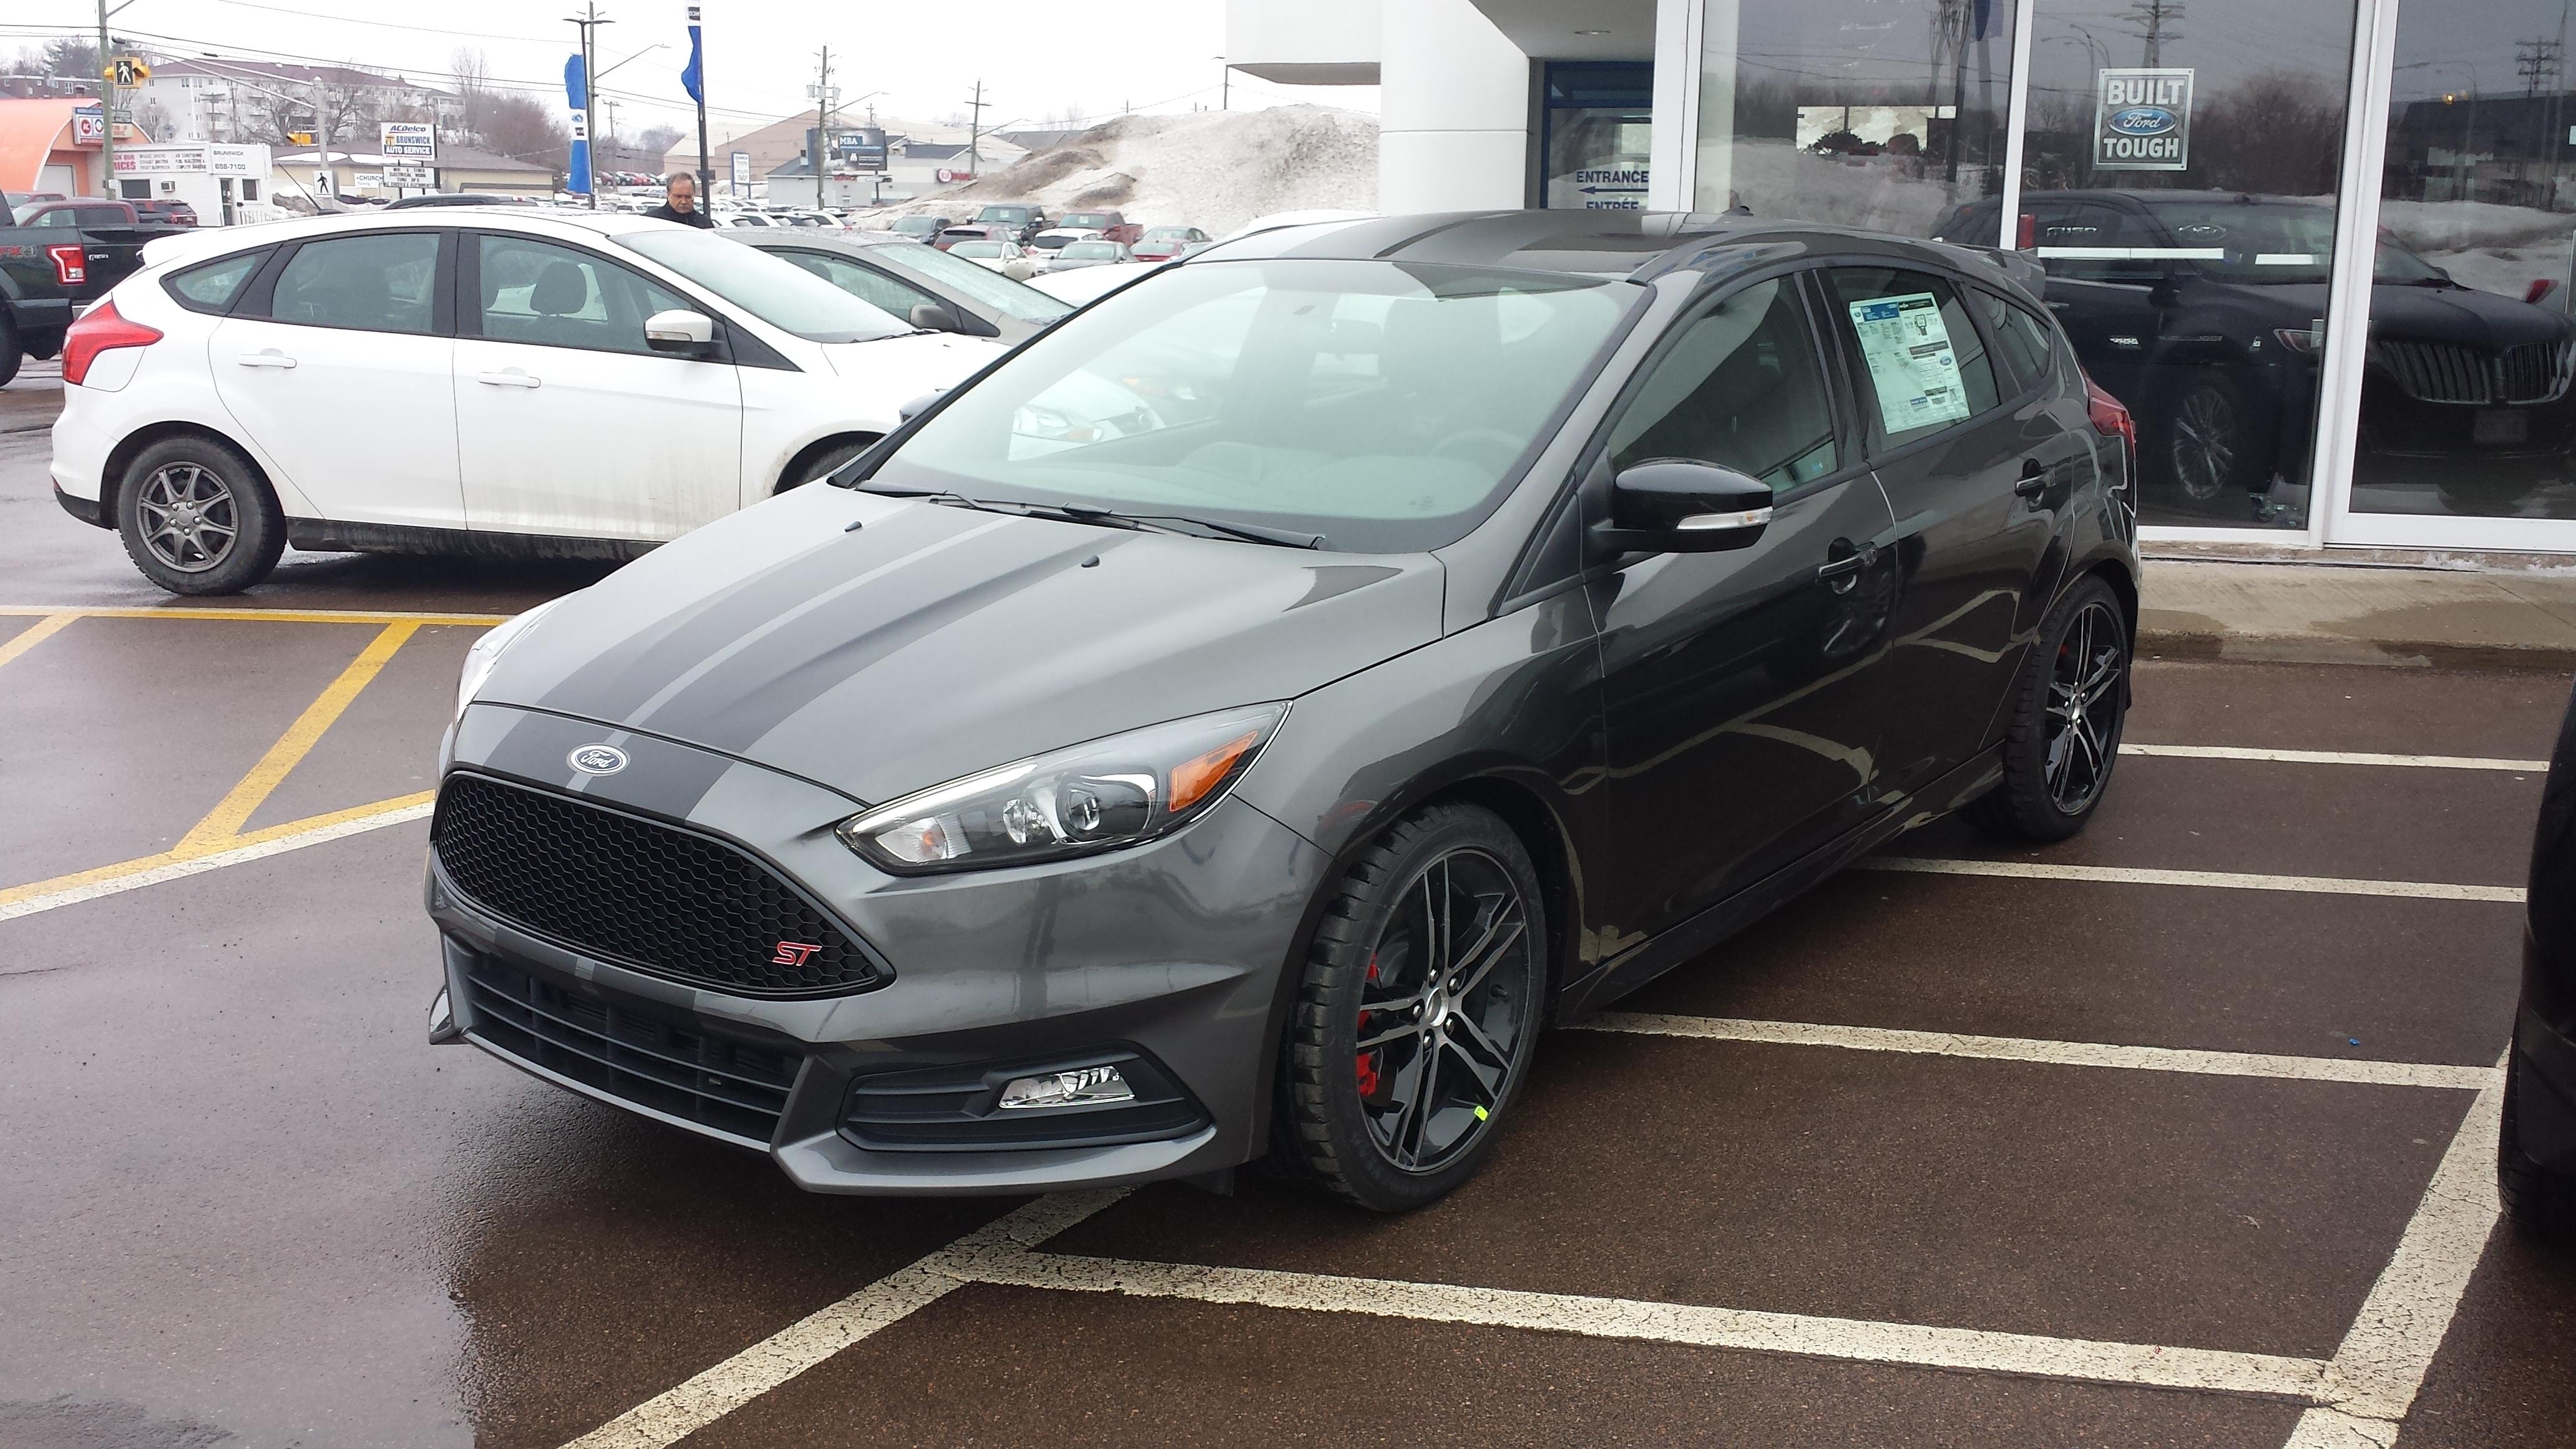 name 20150404_132602jpg views 22206 size 359 mb - 2015 Ford Focus St Magnetic Metallic